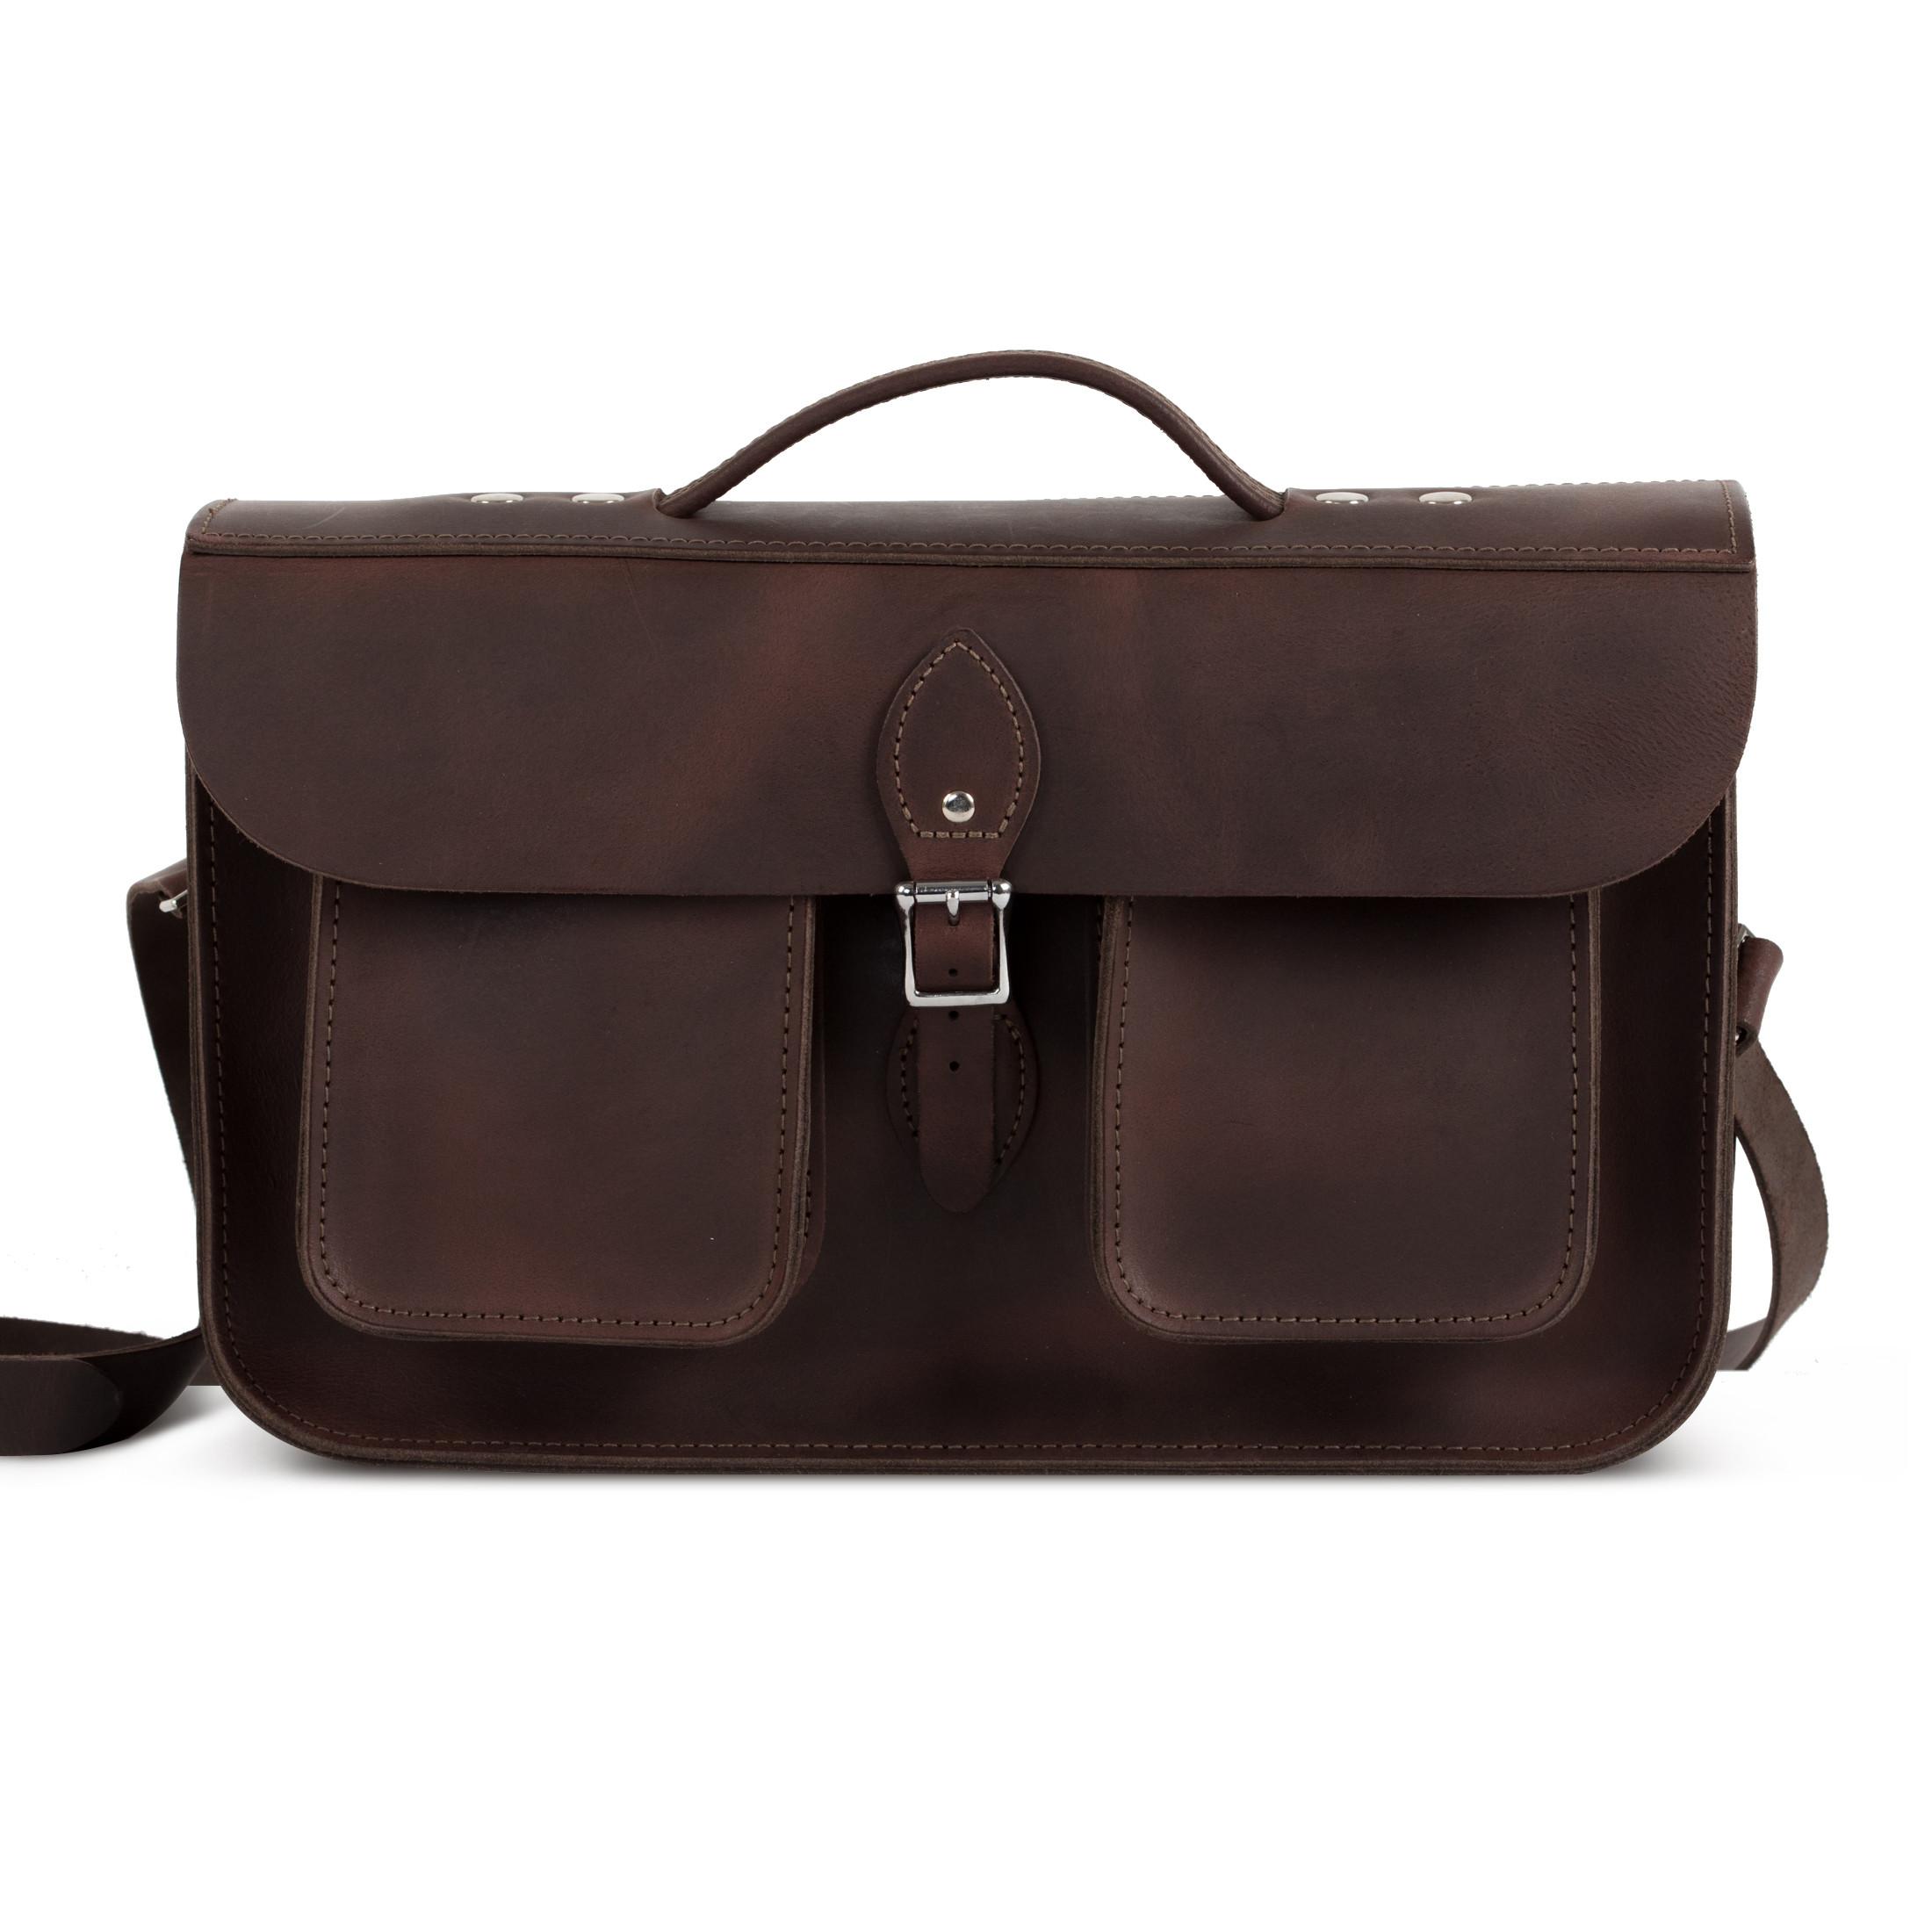 Jude Premium Leather Briefcase in Vintage Brown